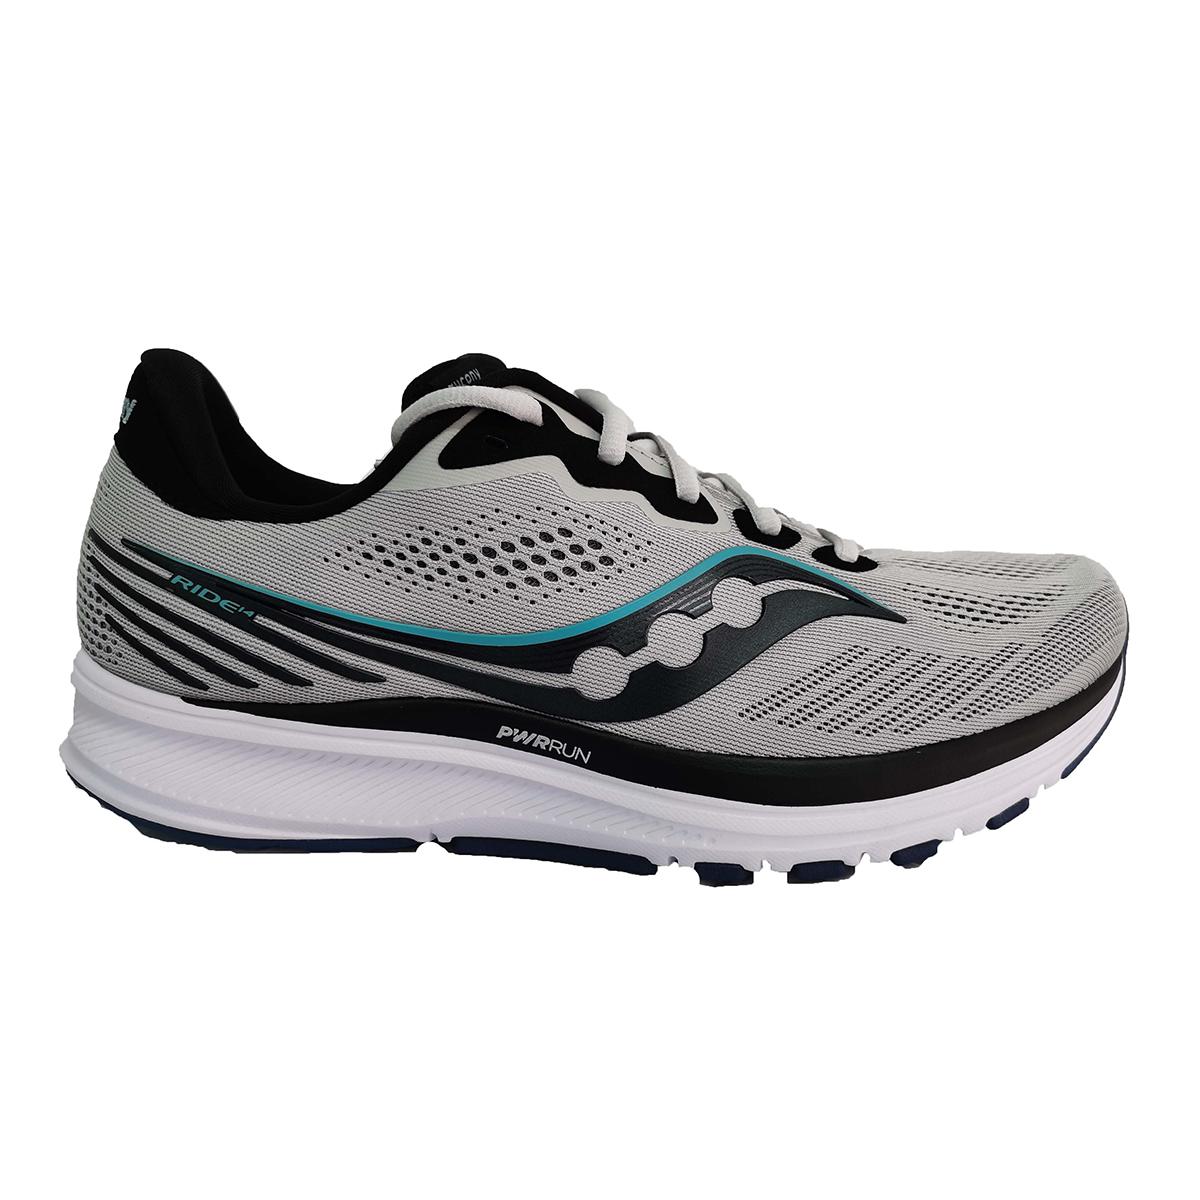 Men's Saucony Ride 14 Running Shoe, , large, image 1